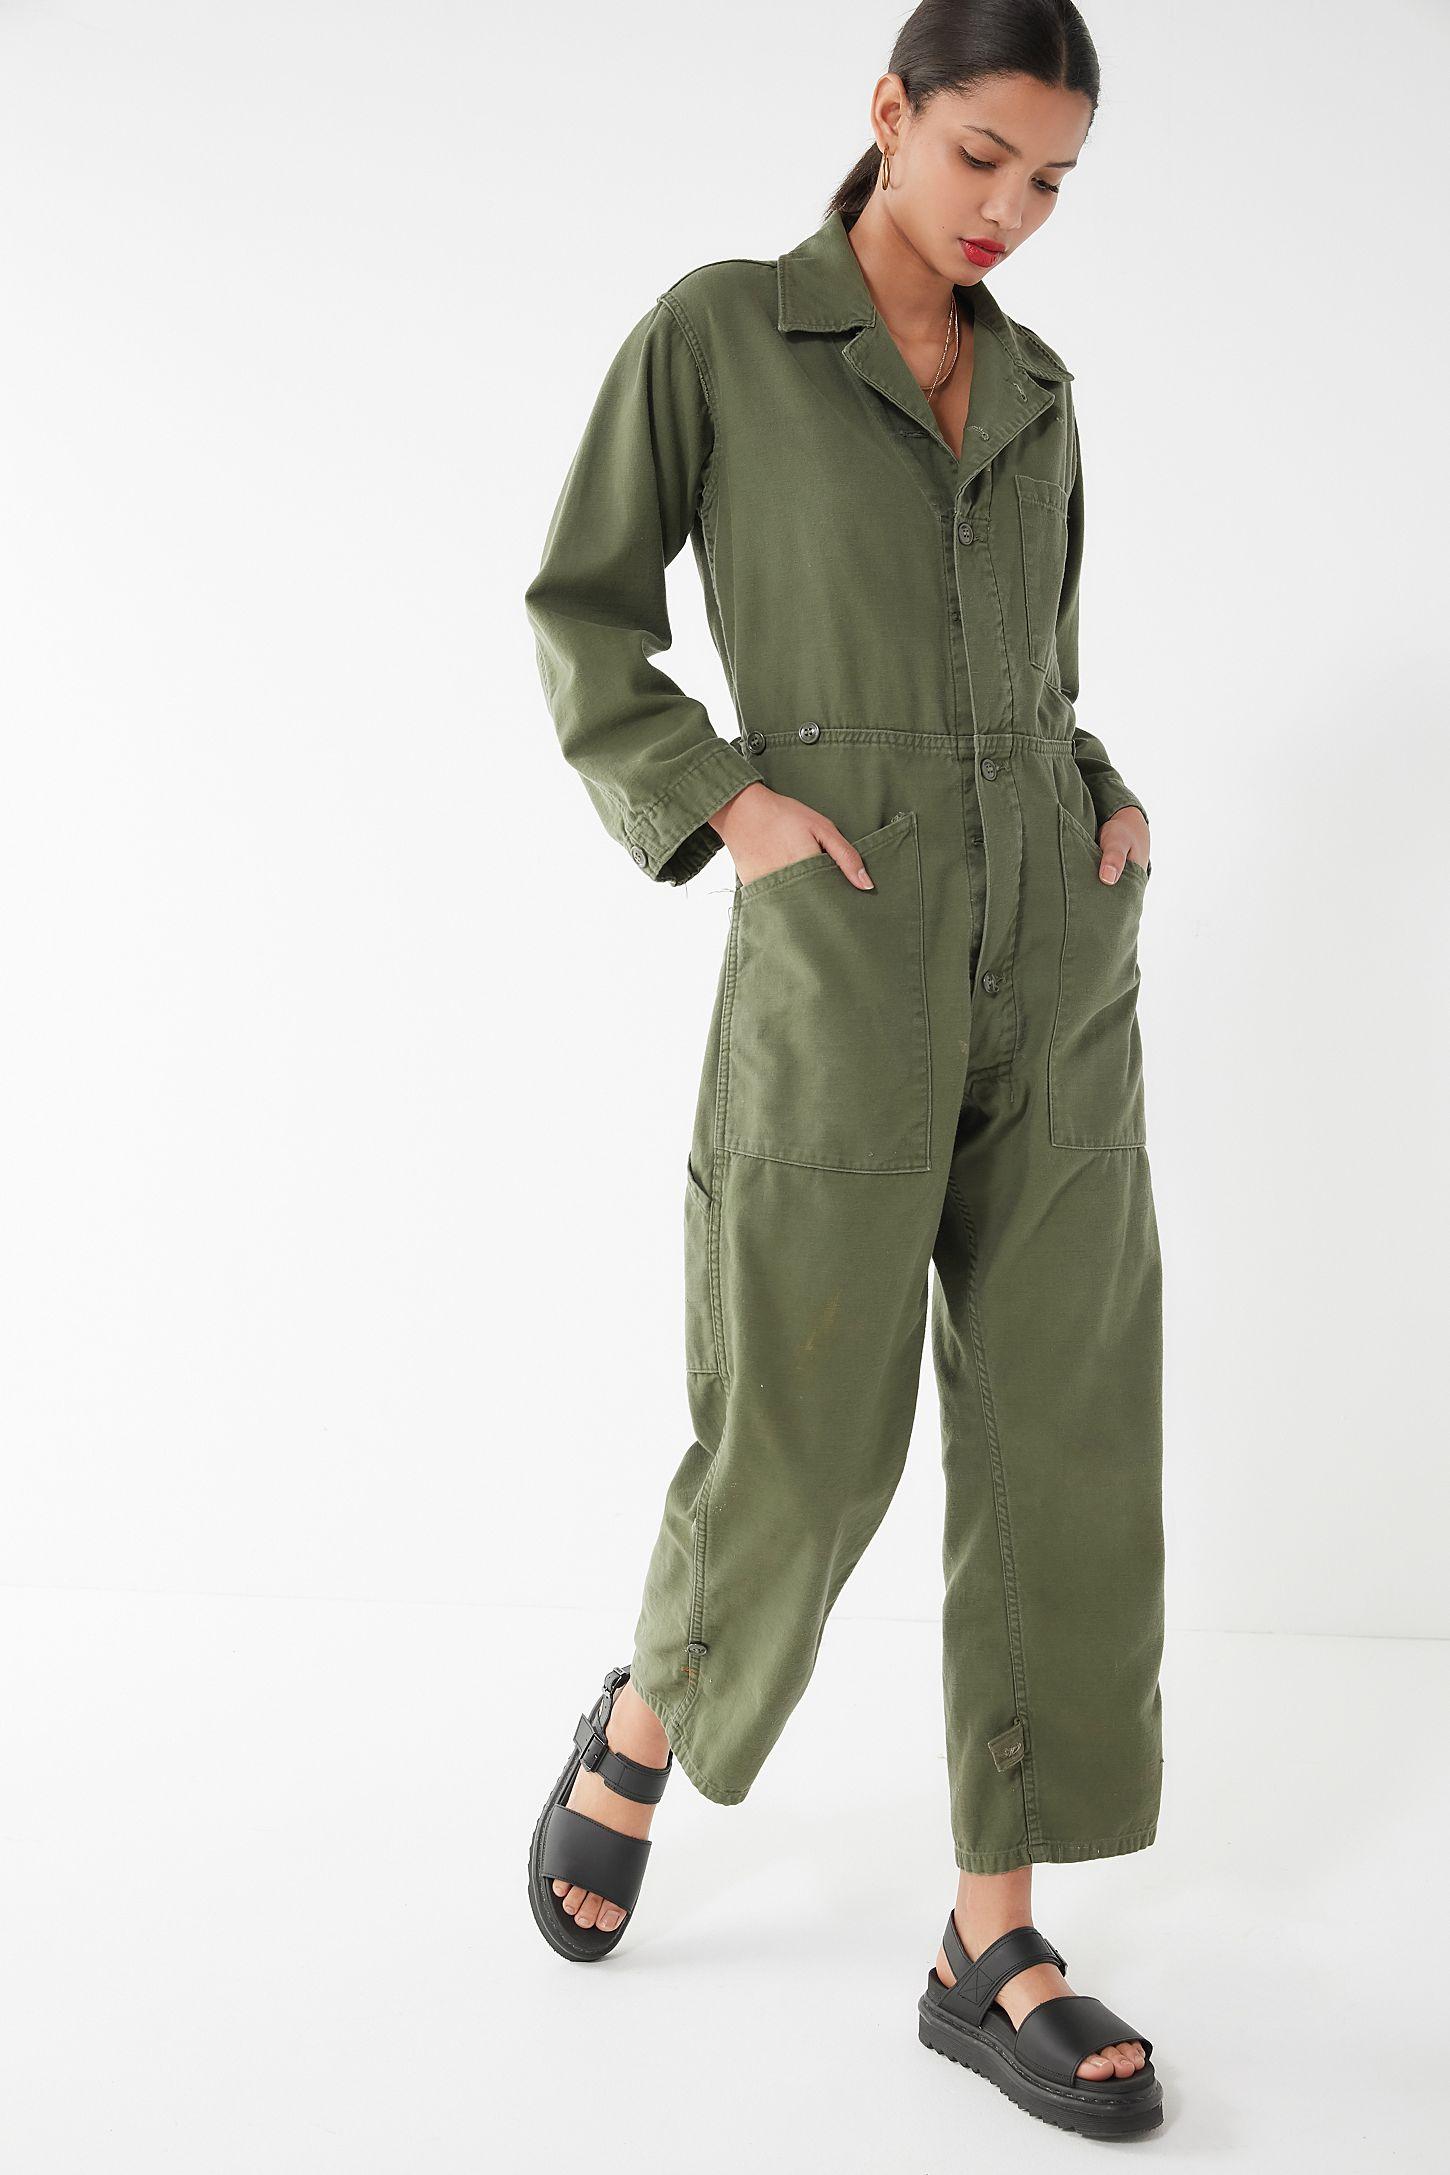 Wonderlijk Vintage Surplus Coverall Jumpsuit | Urban Outfitters MY-89